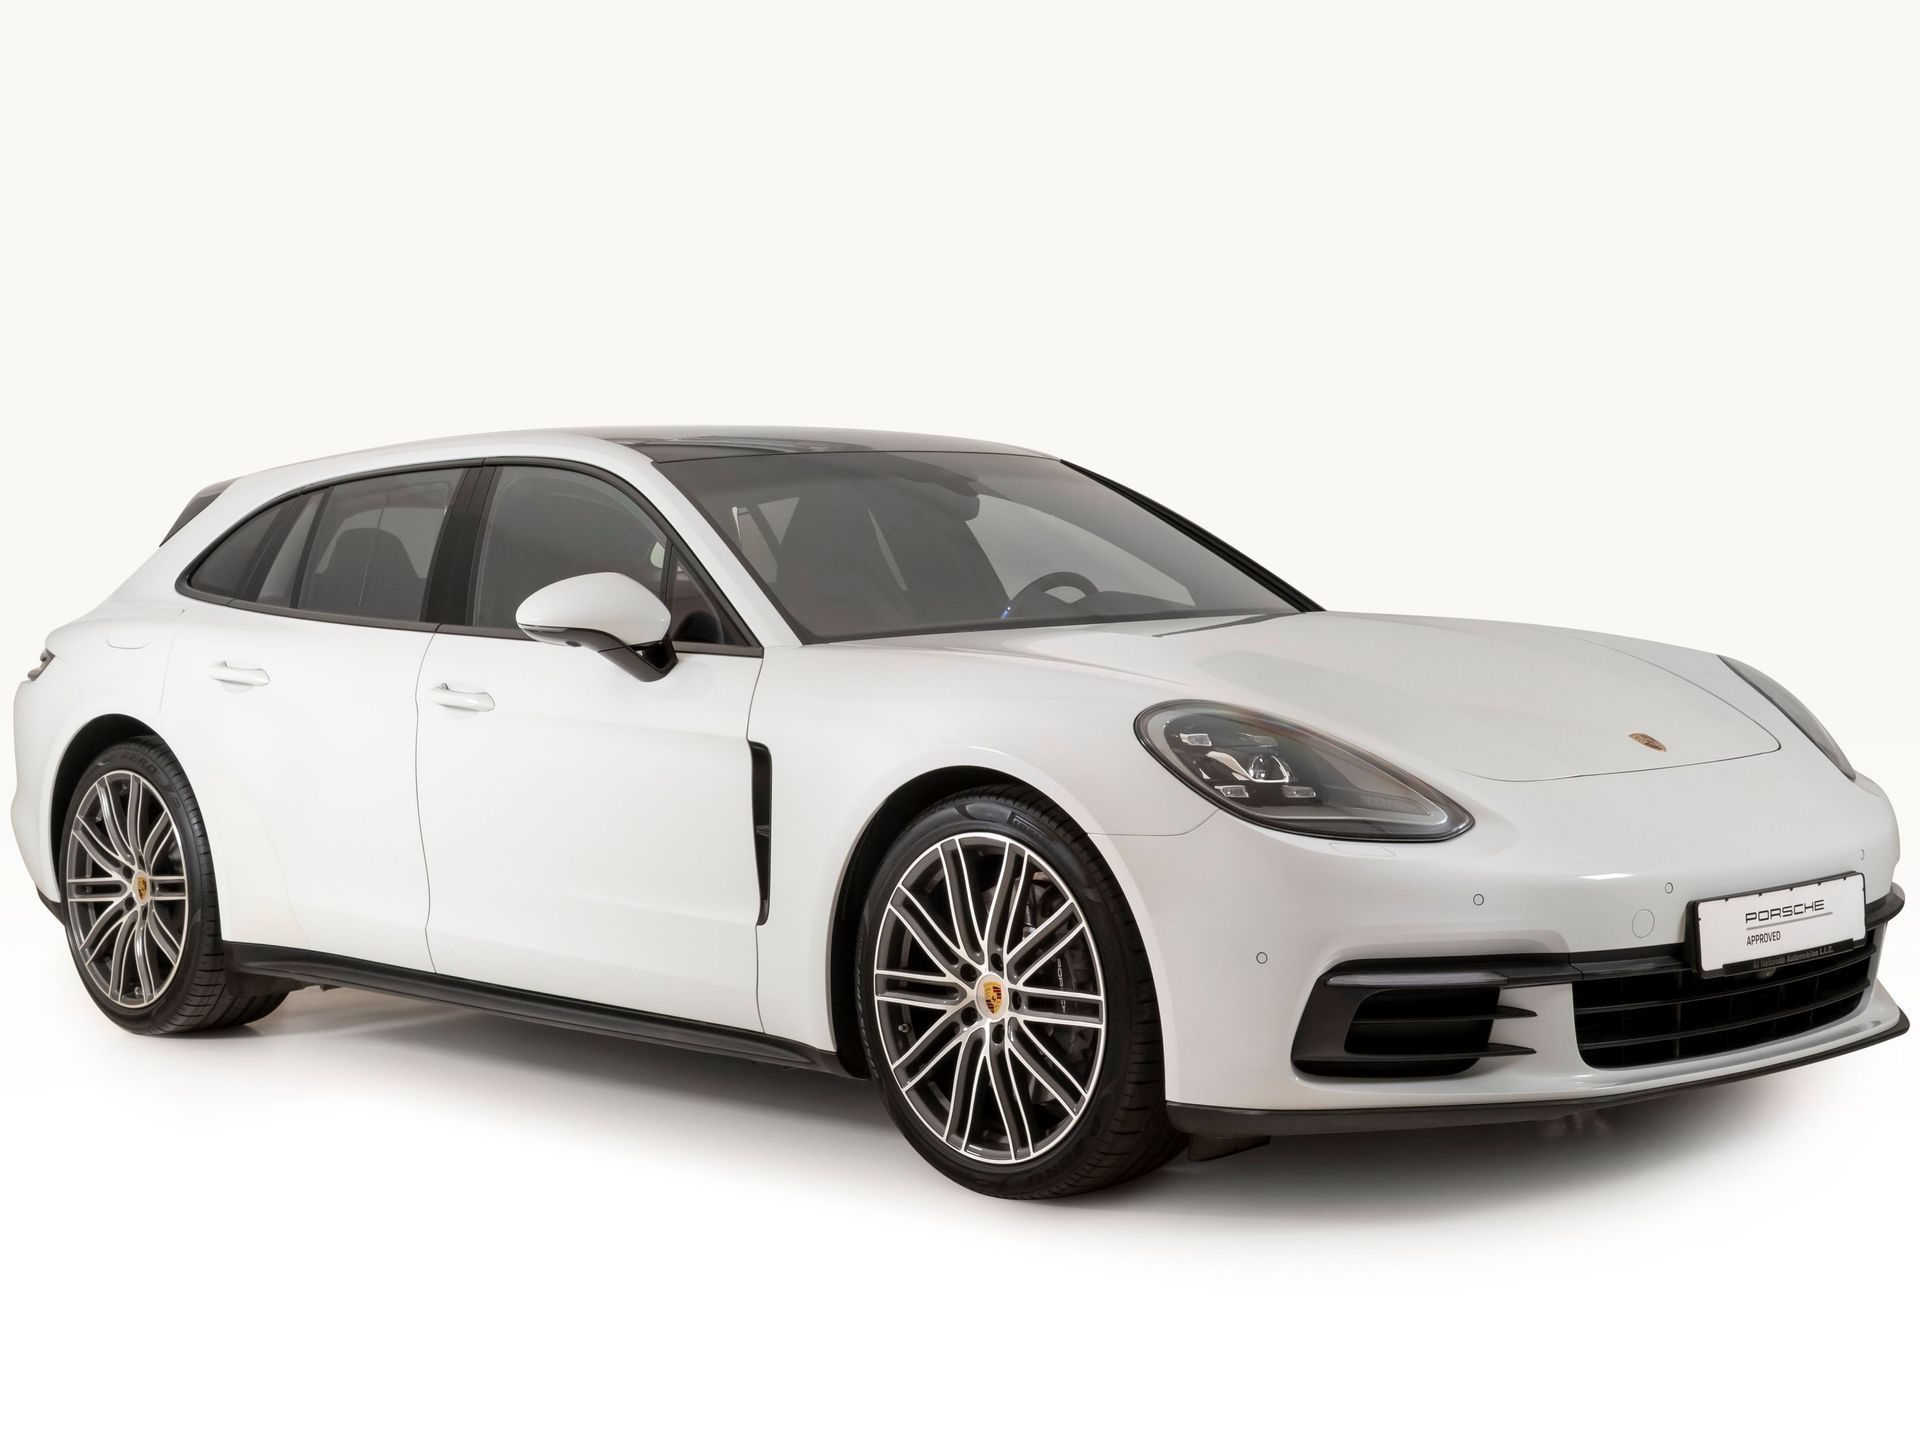 2018 Porsche Panamera 4 Sport Turismo – 5